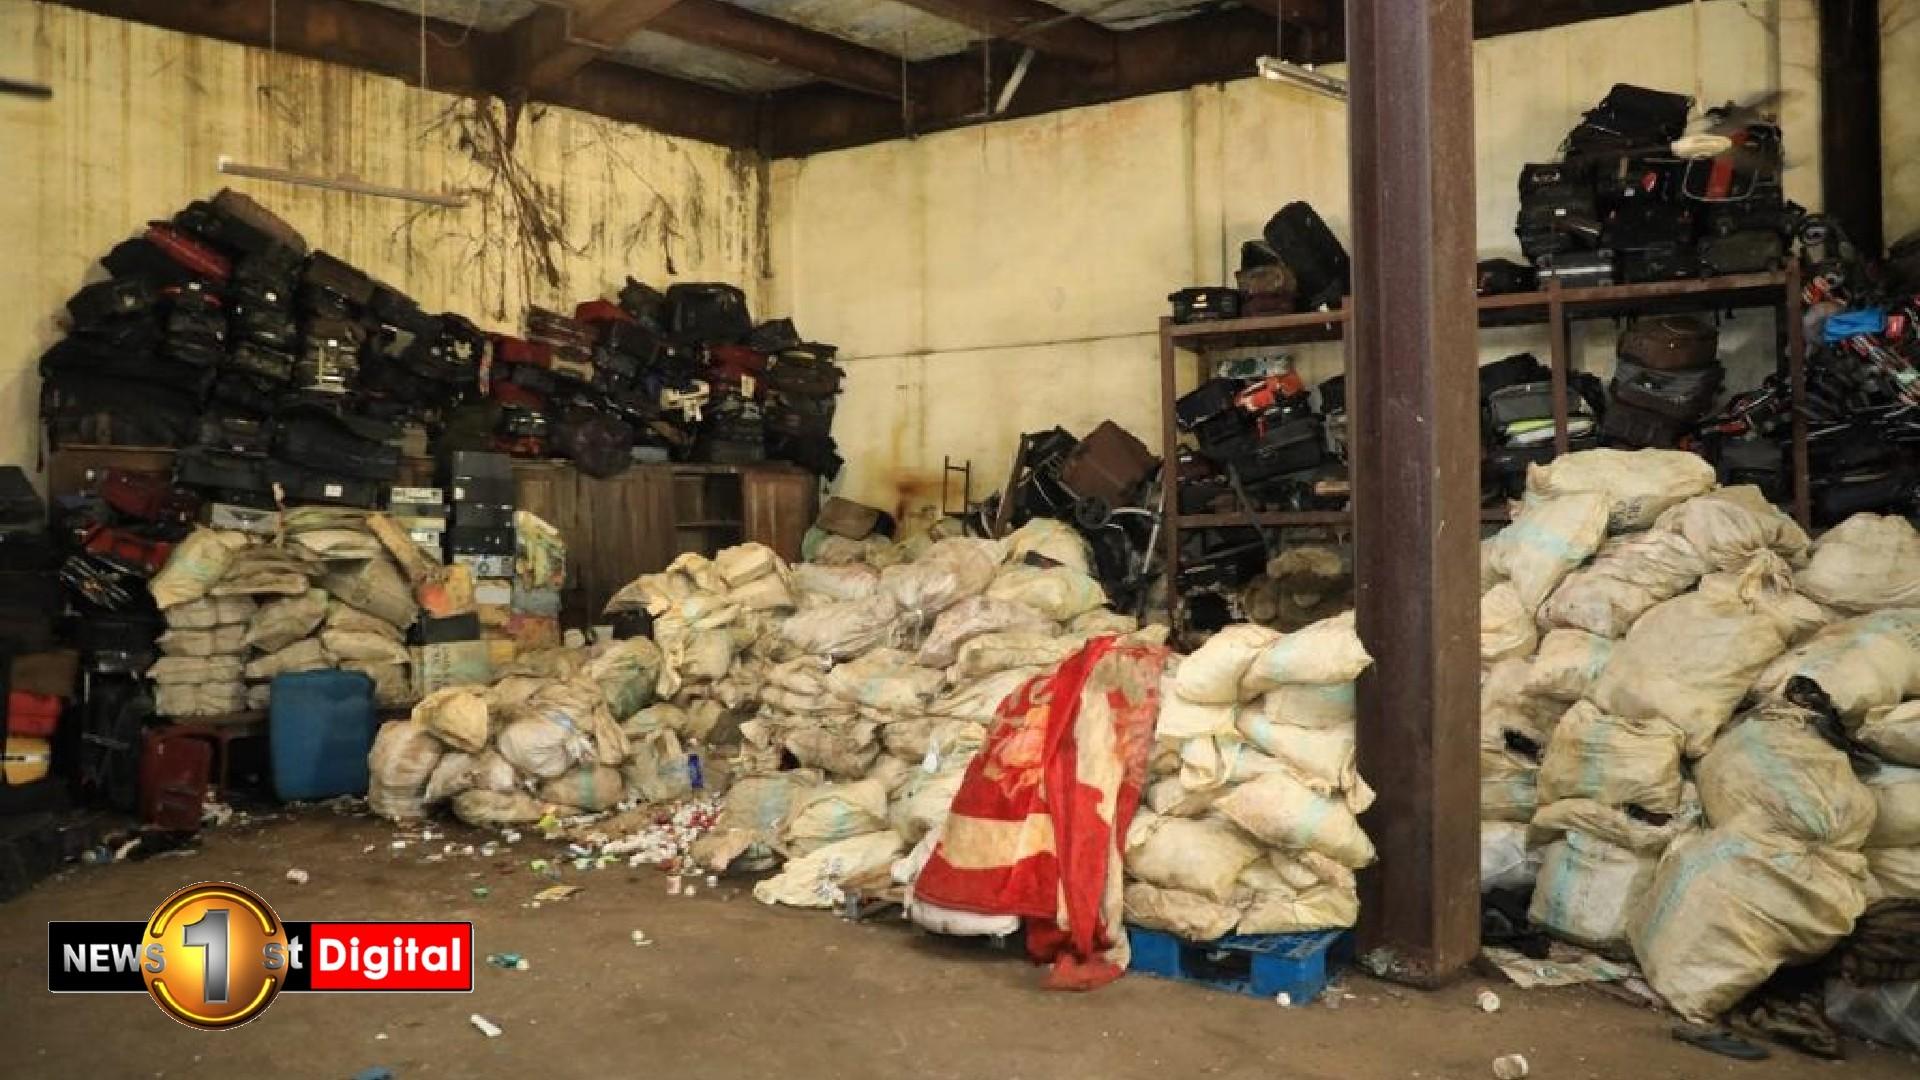 d342f101 bonded warehouses inspection 5